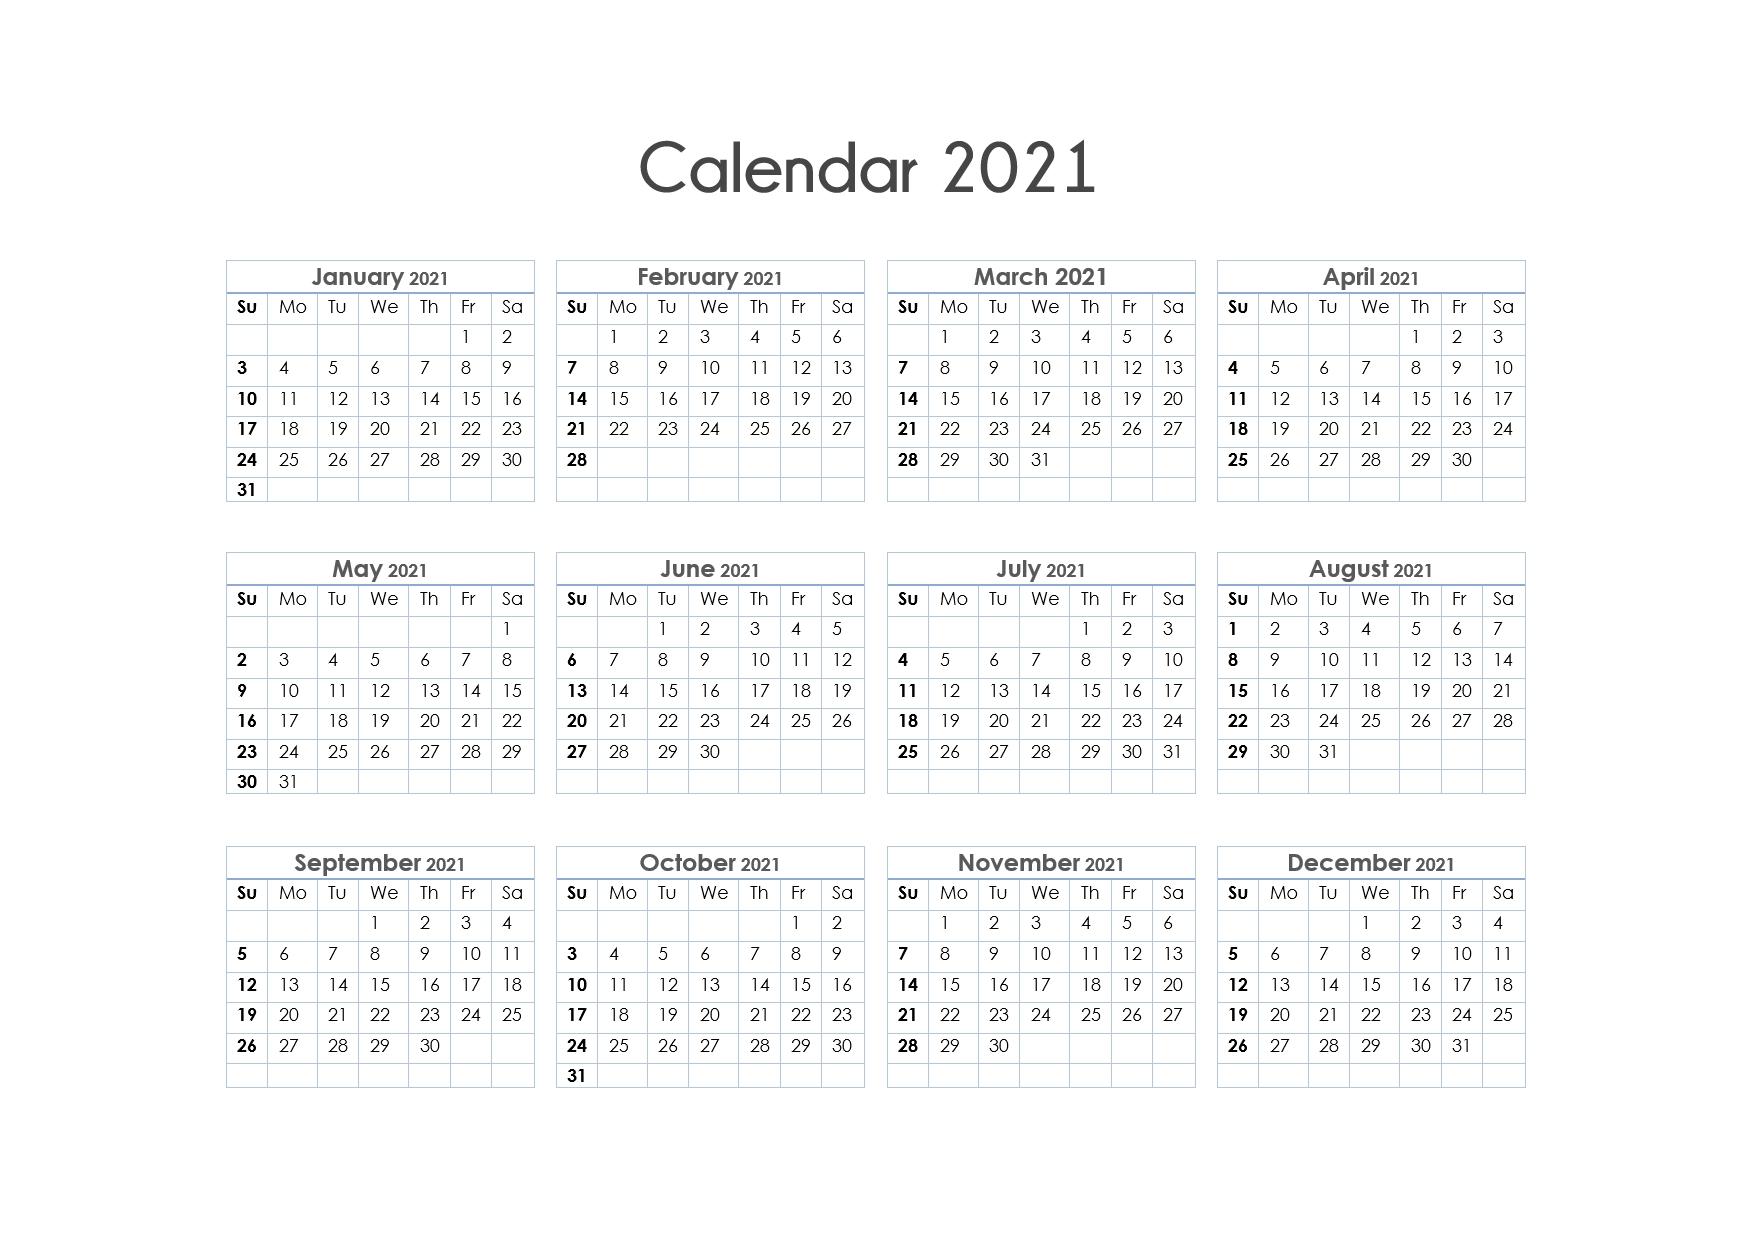 Fill In The Blank Calendar 2021 - Template Calendar Design